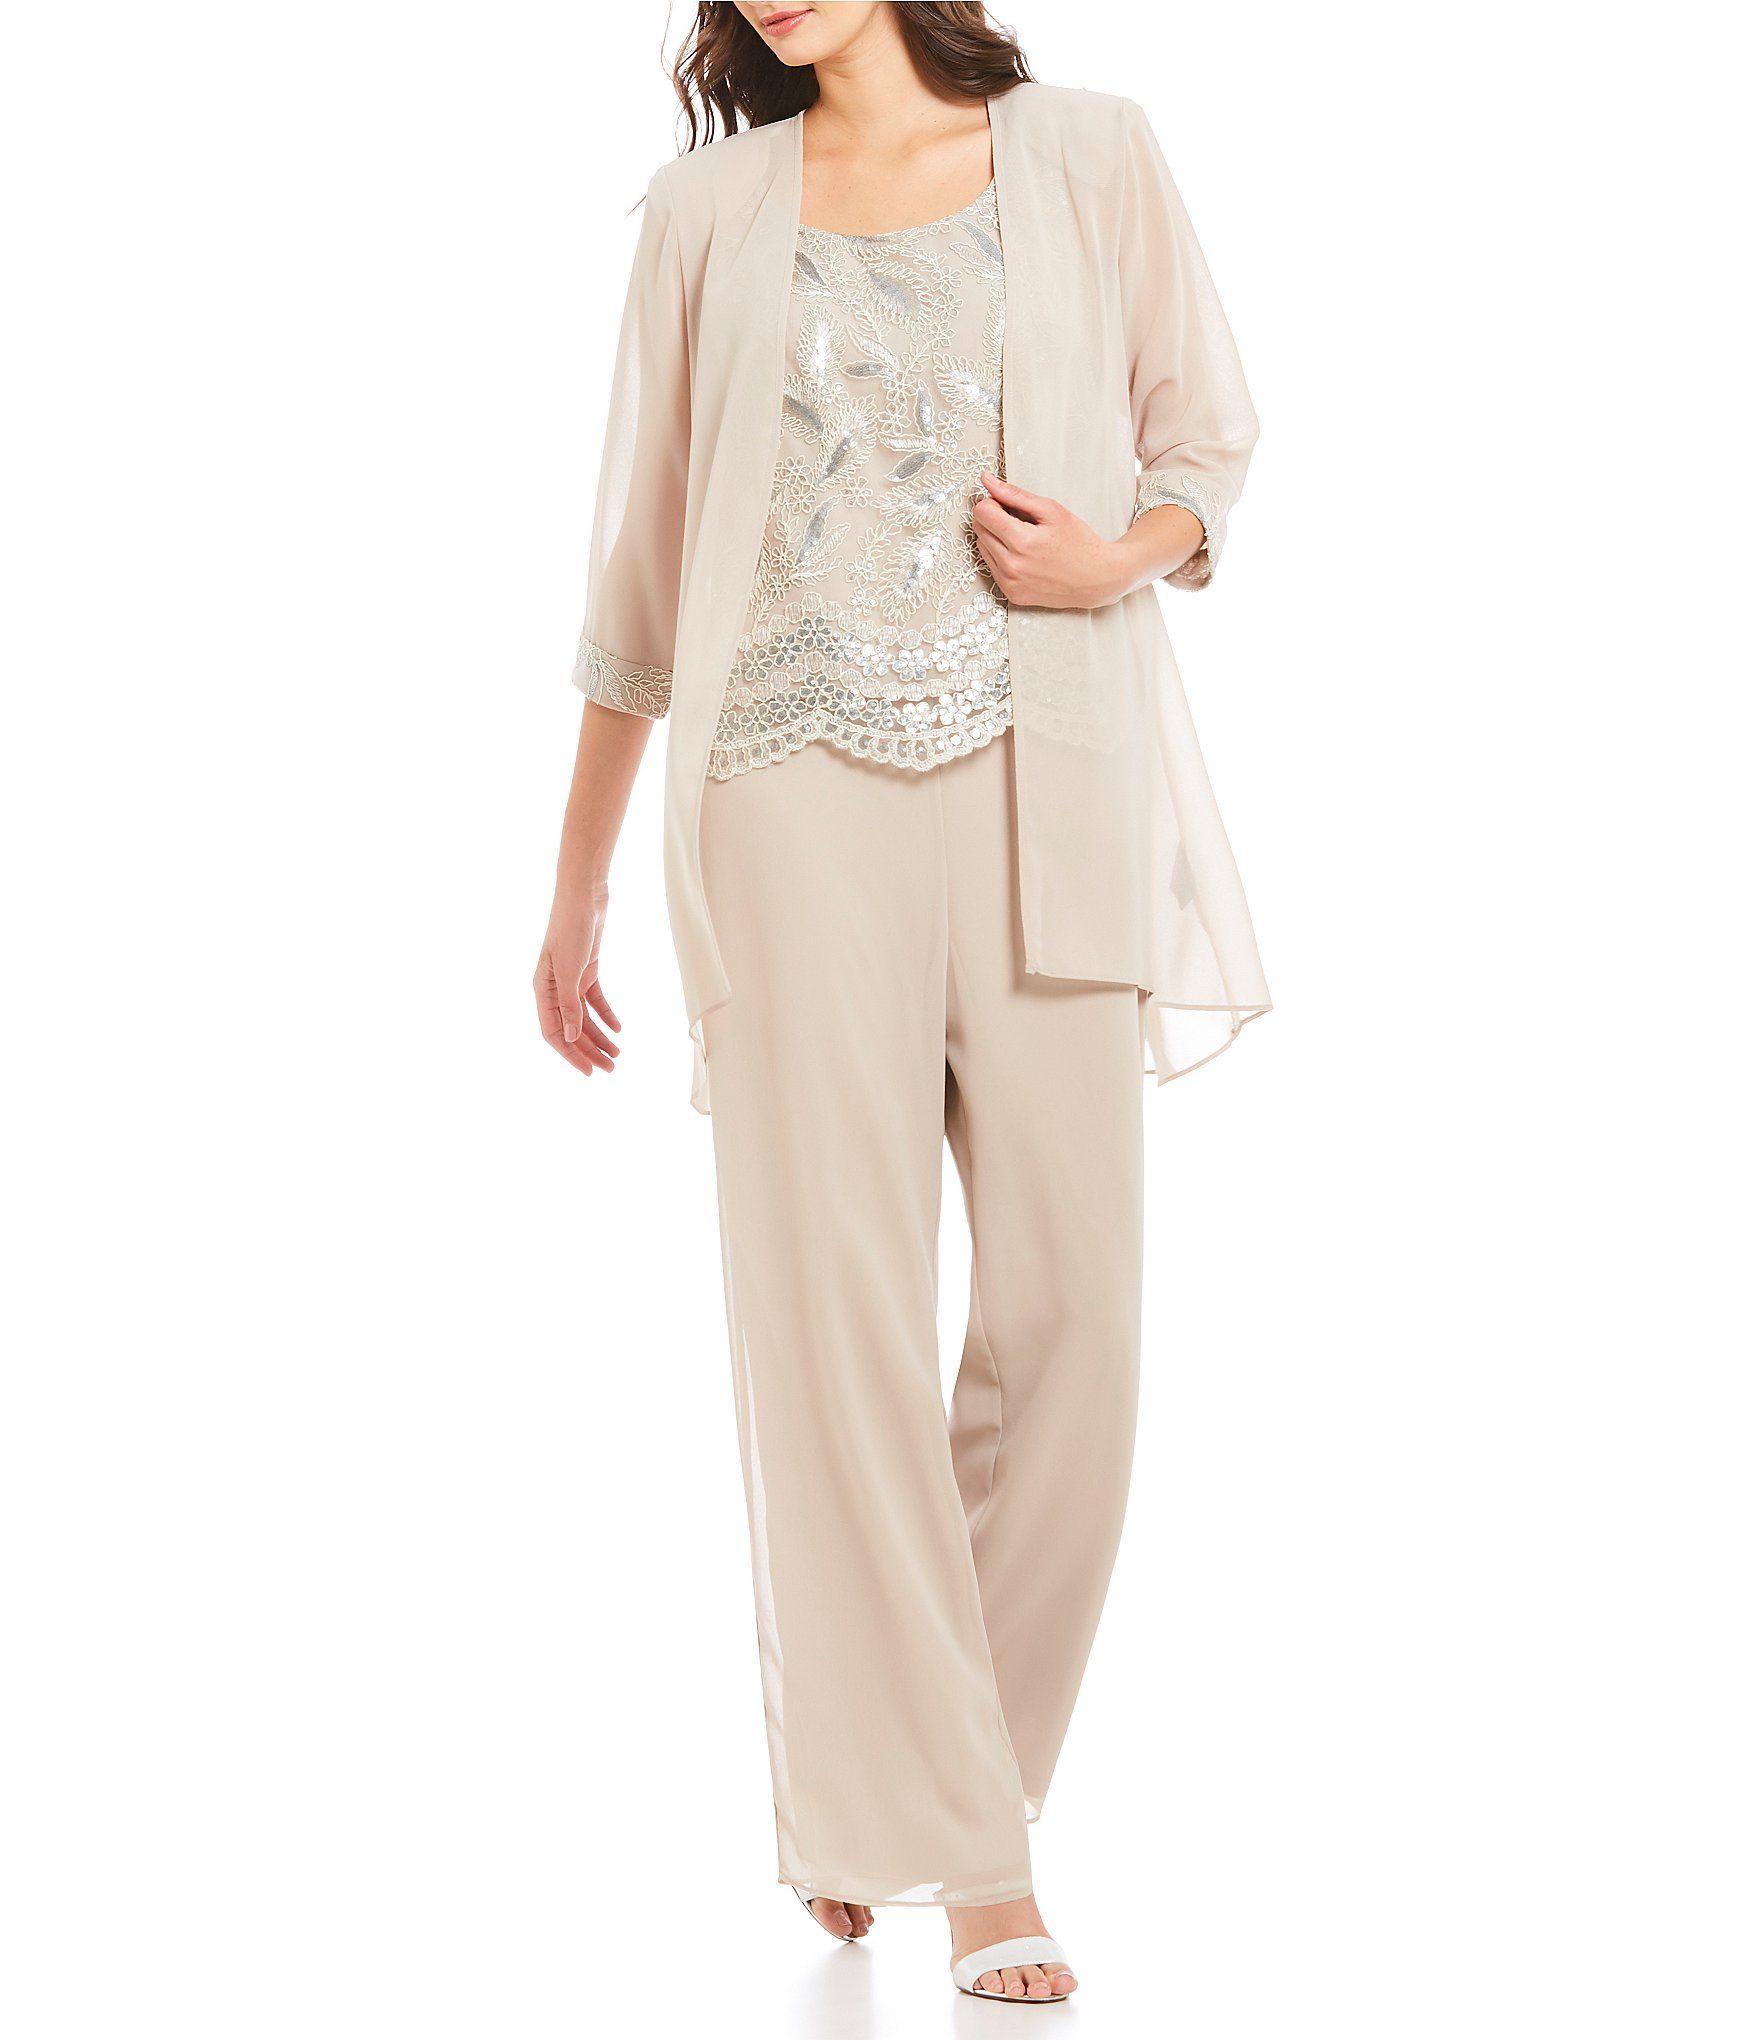 Dillards Pantsuits For Weddings